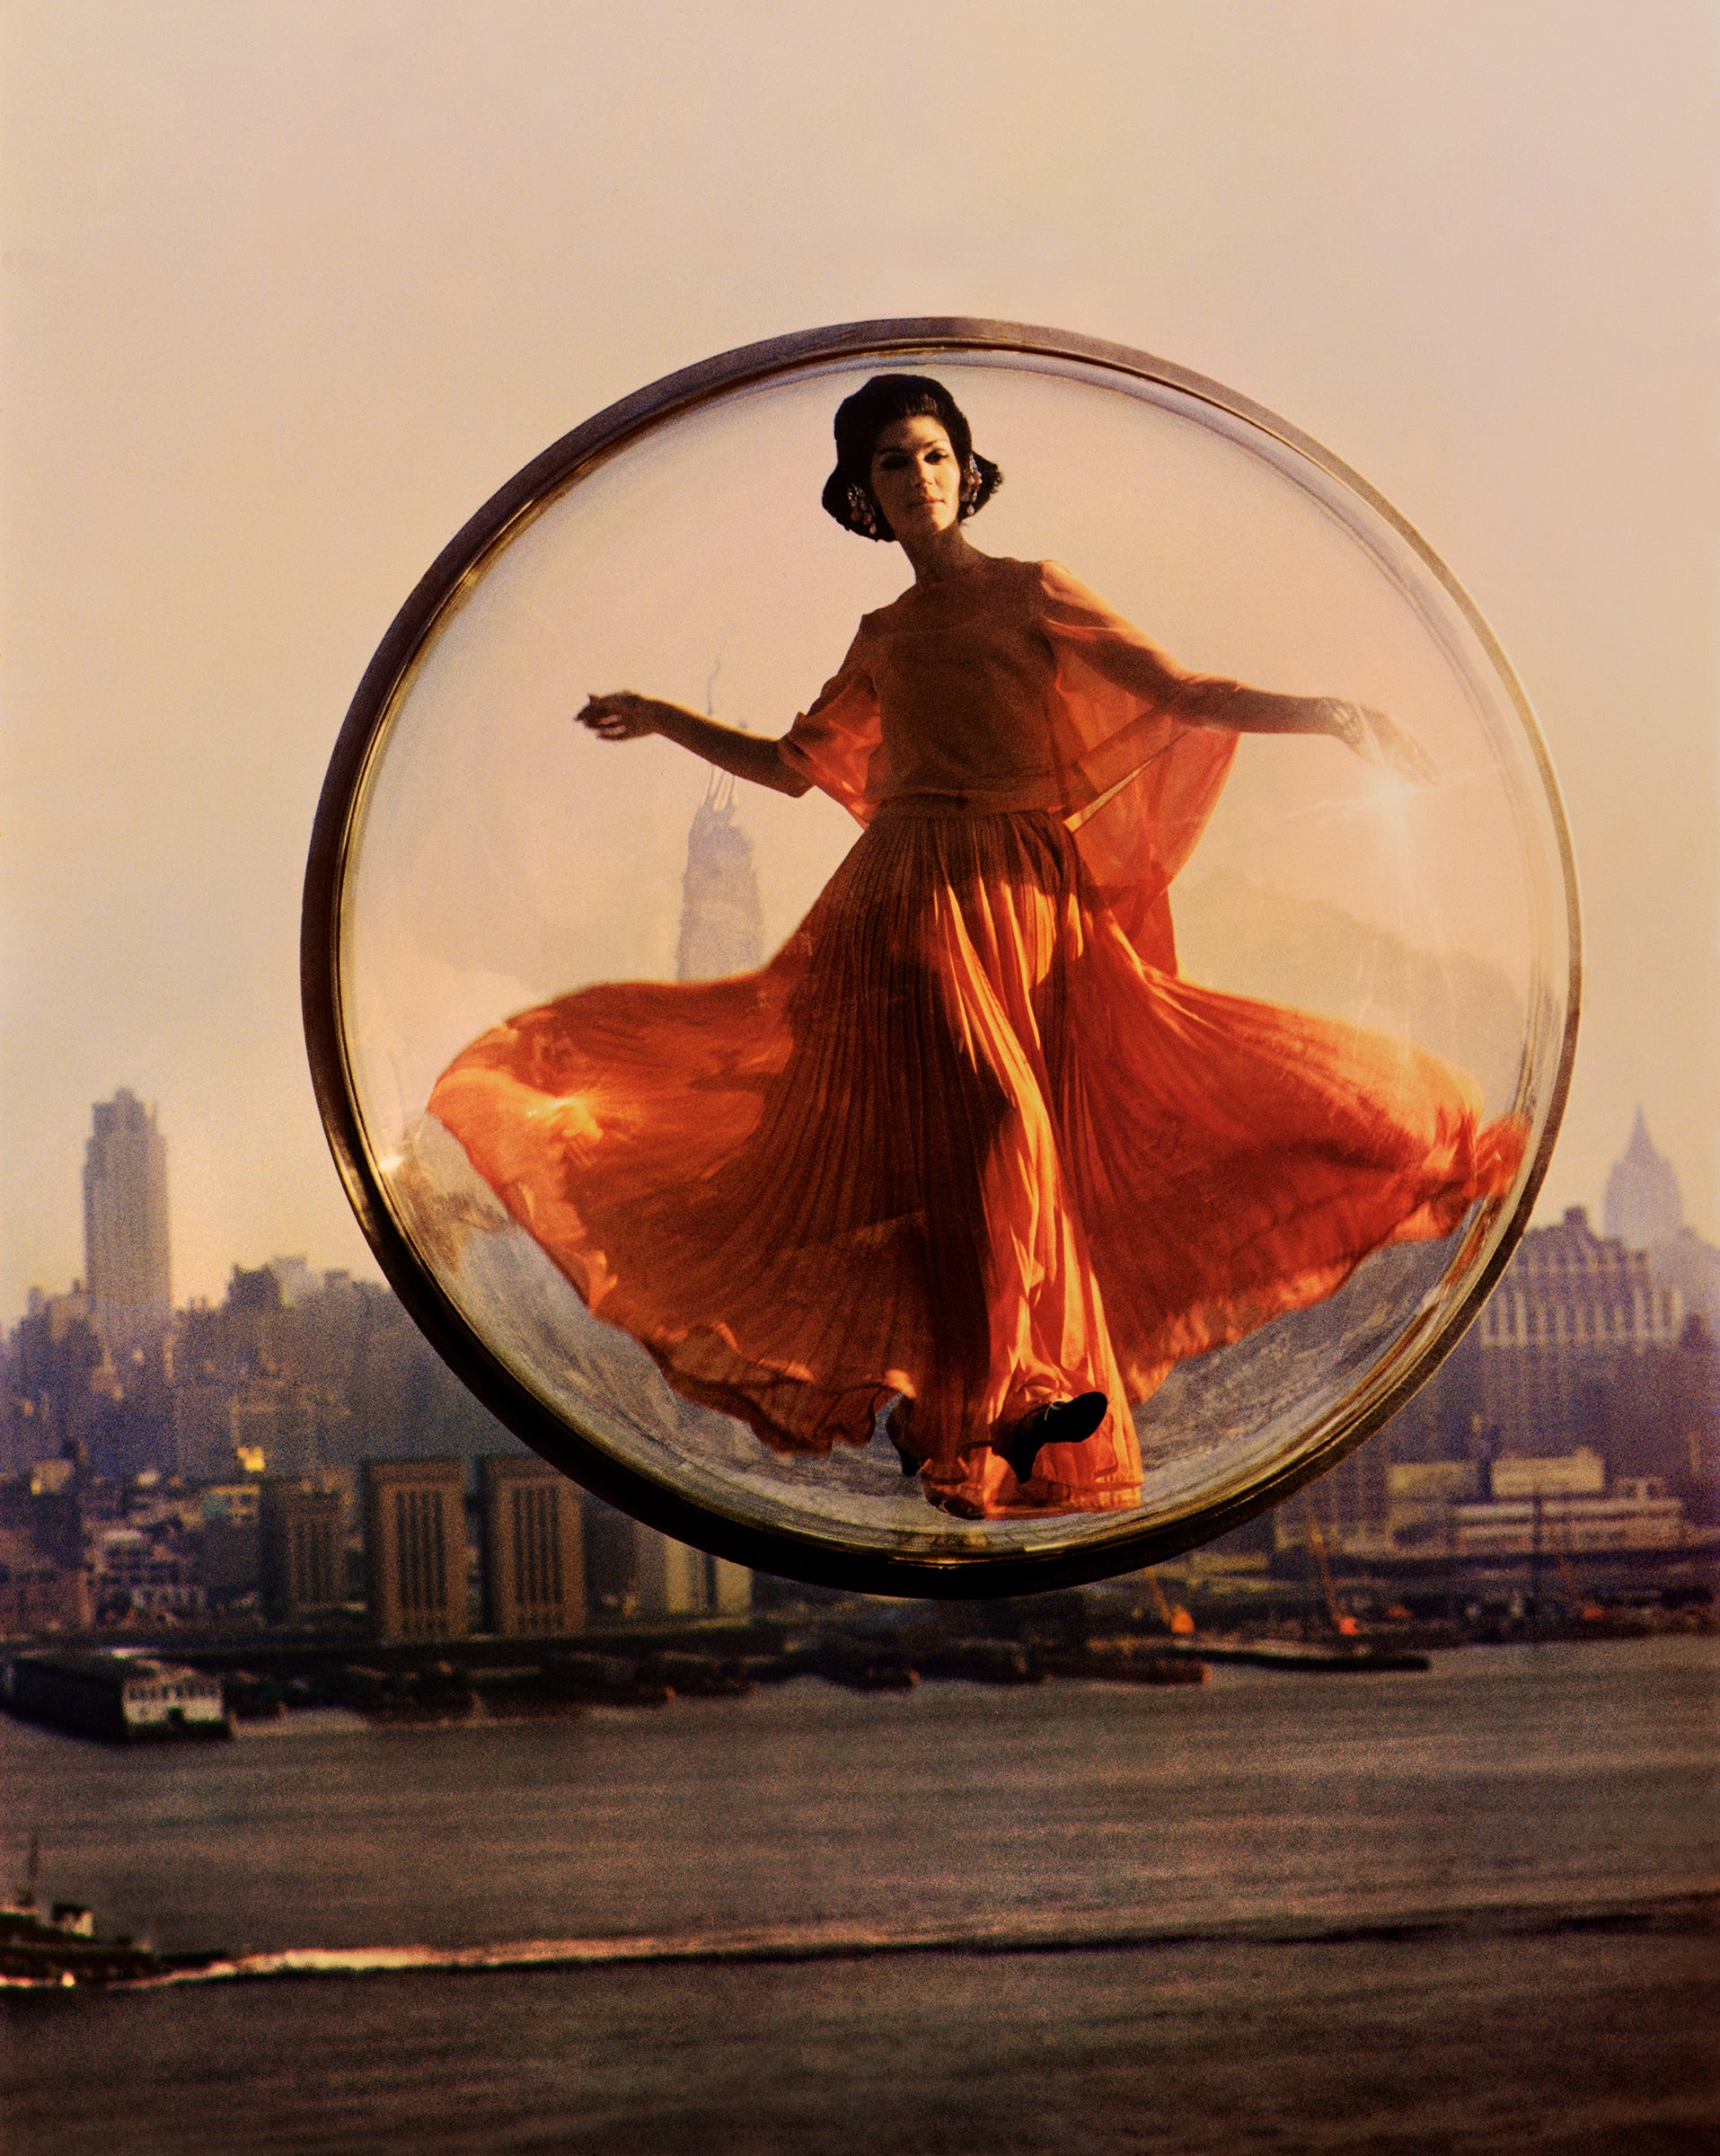 Over New York - Melvin Sokolsky (Colour Photography)